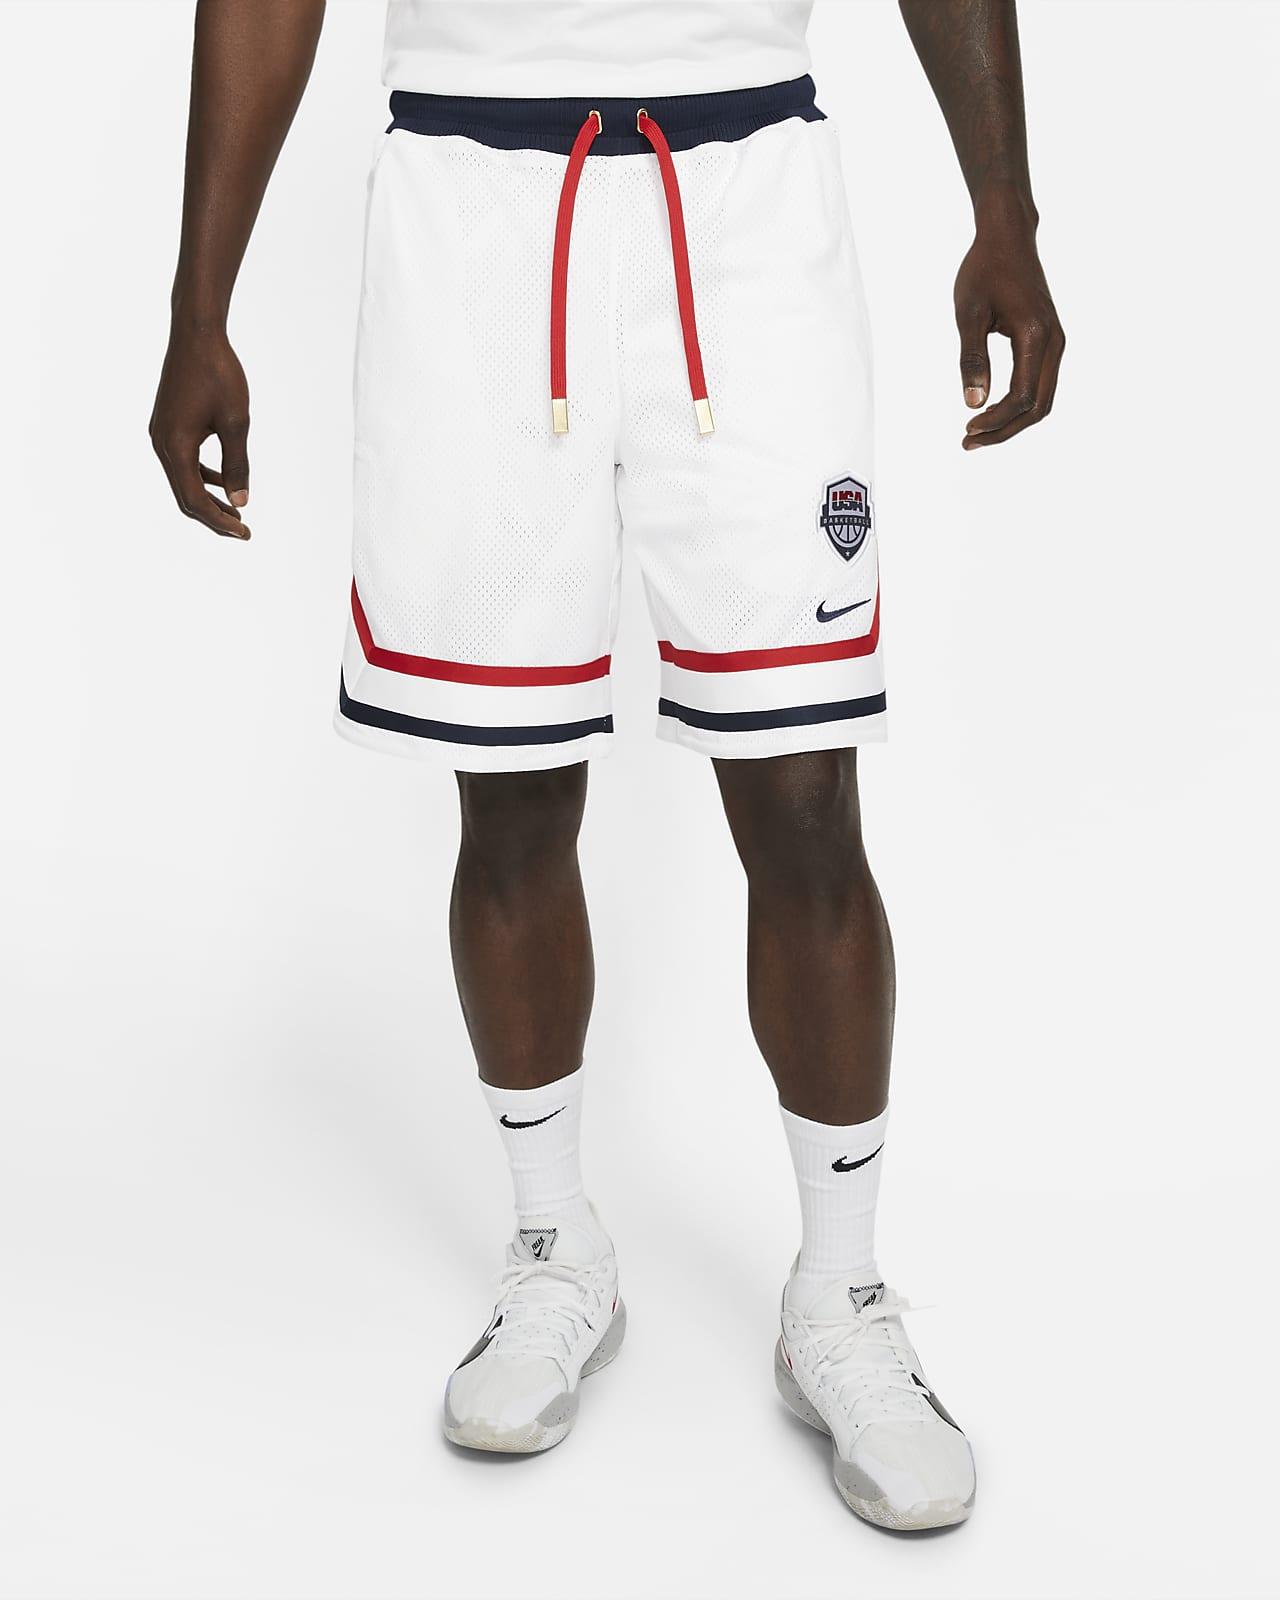 Nike Team USA Courtside Men's Basketball Shorts